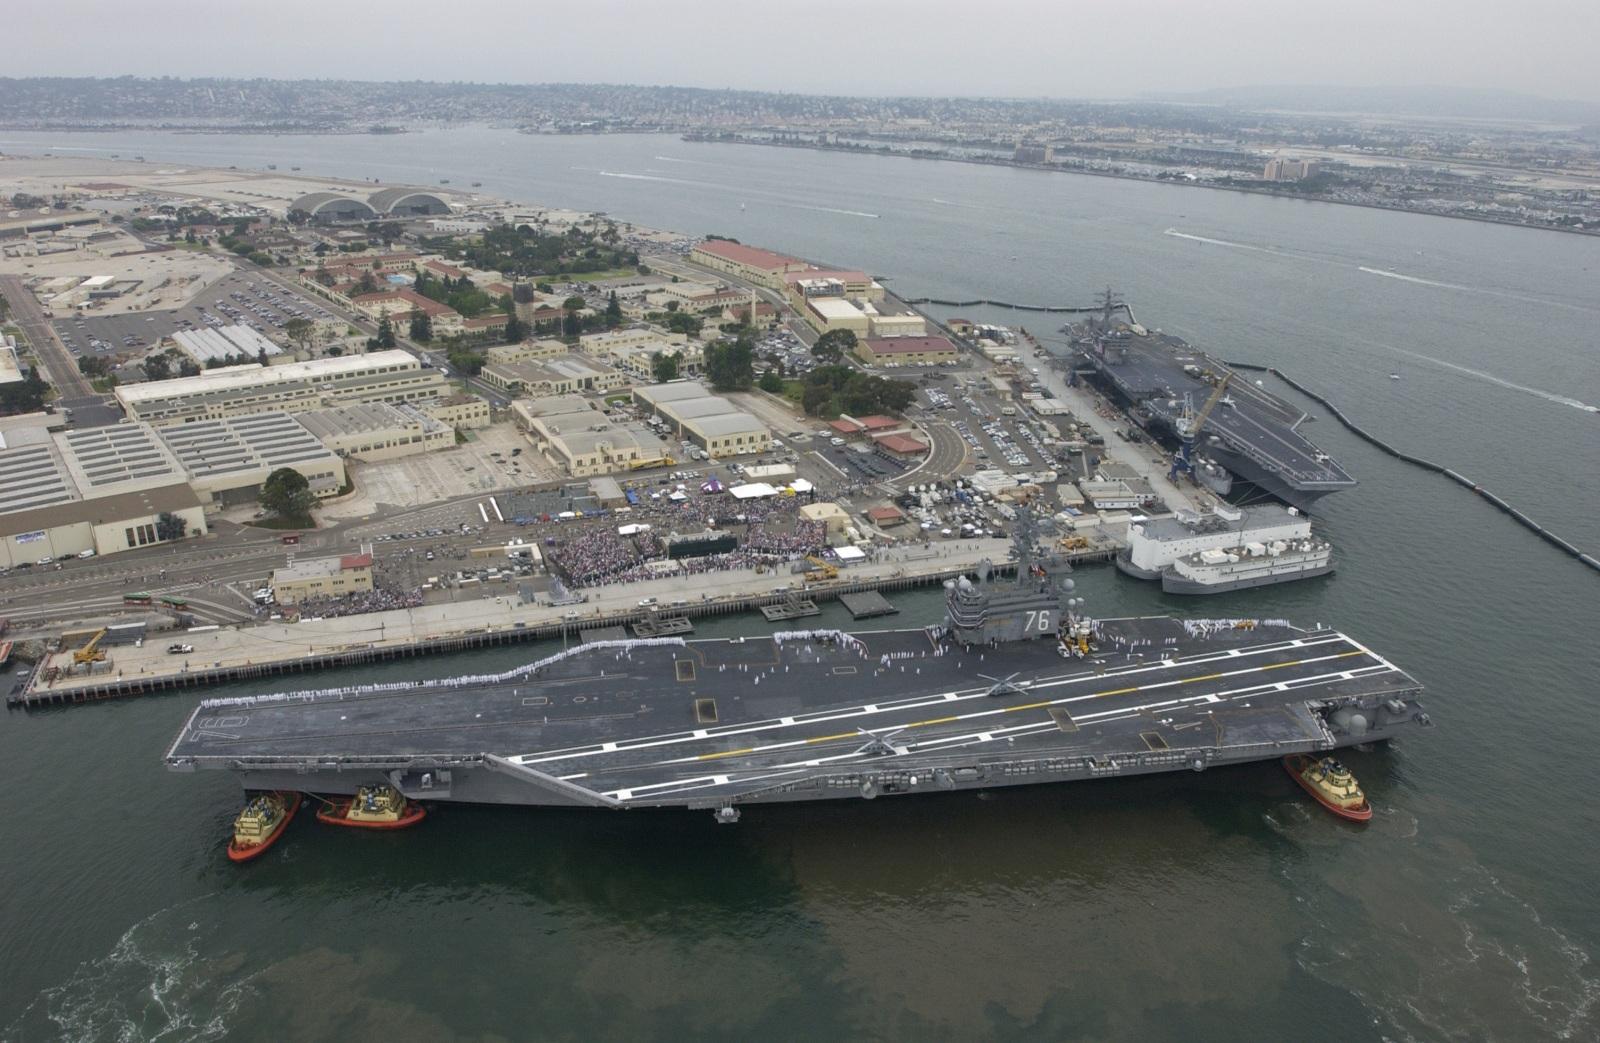 Naval base coronado nbc is a consolidated navy installation